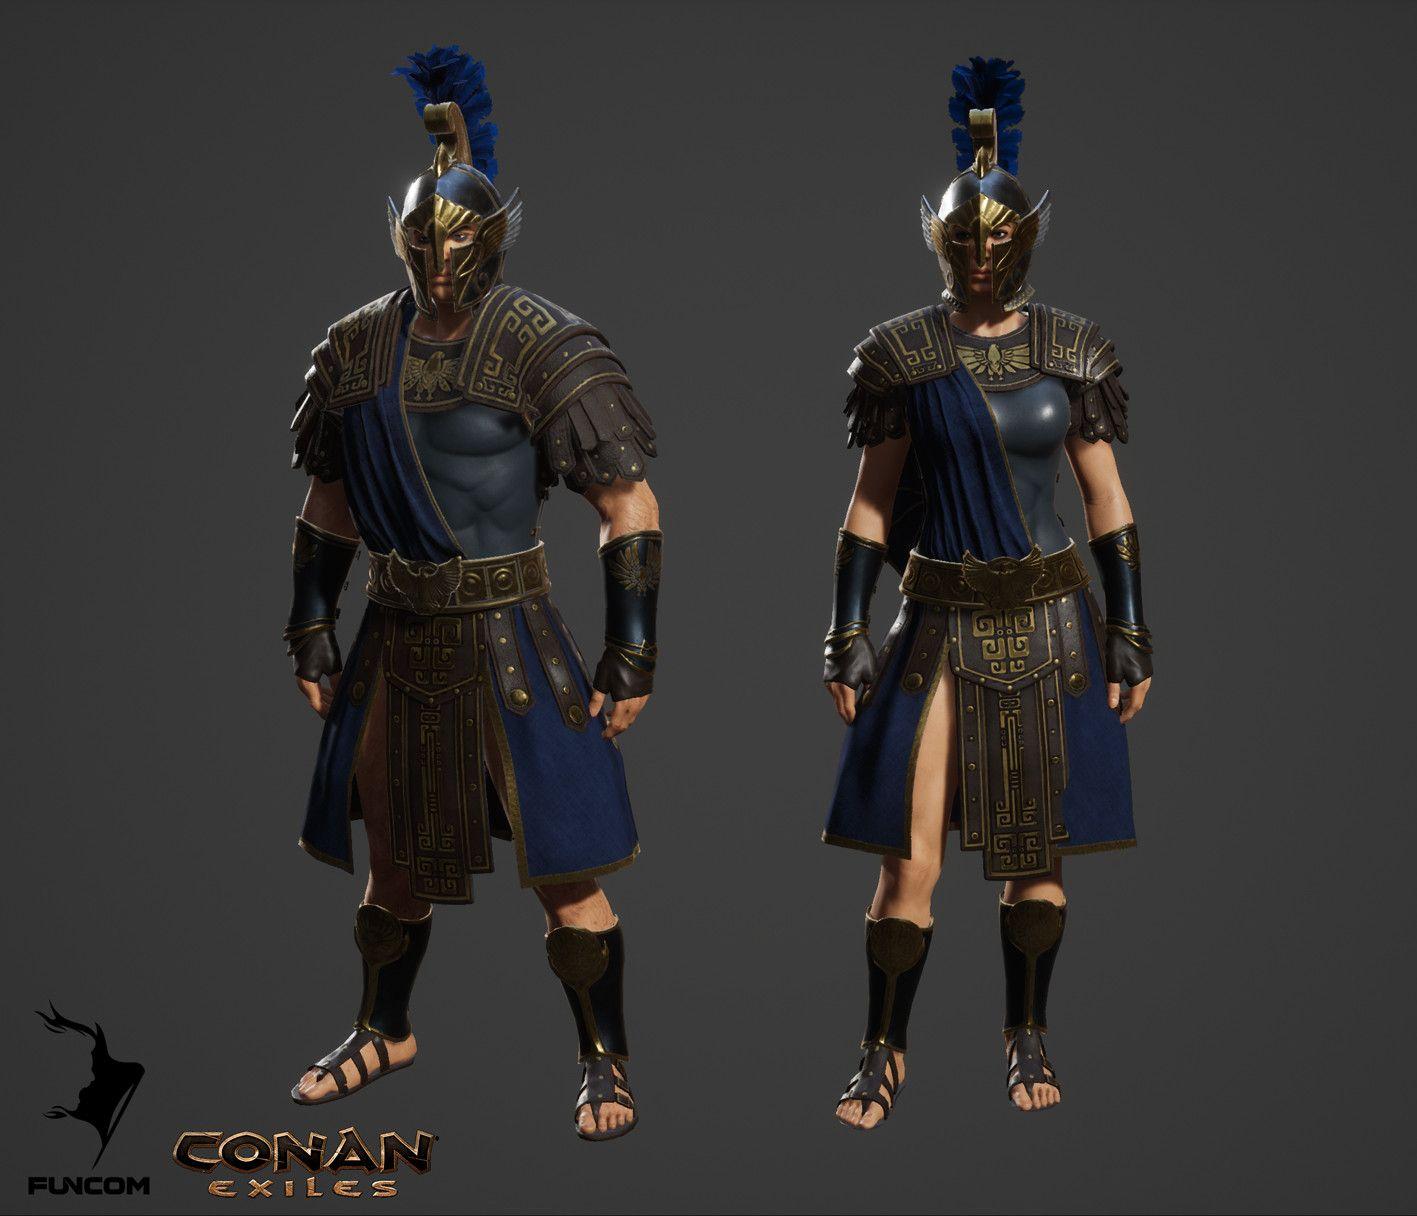 ArtStation - Conan Exiles armor and clothing, part 1, Jenni